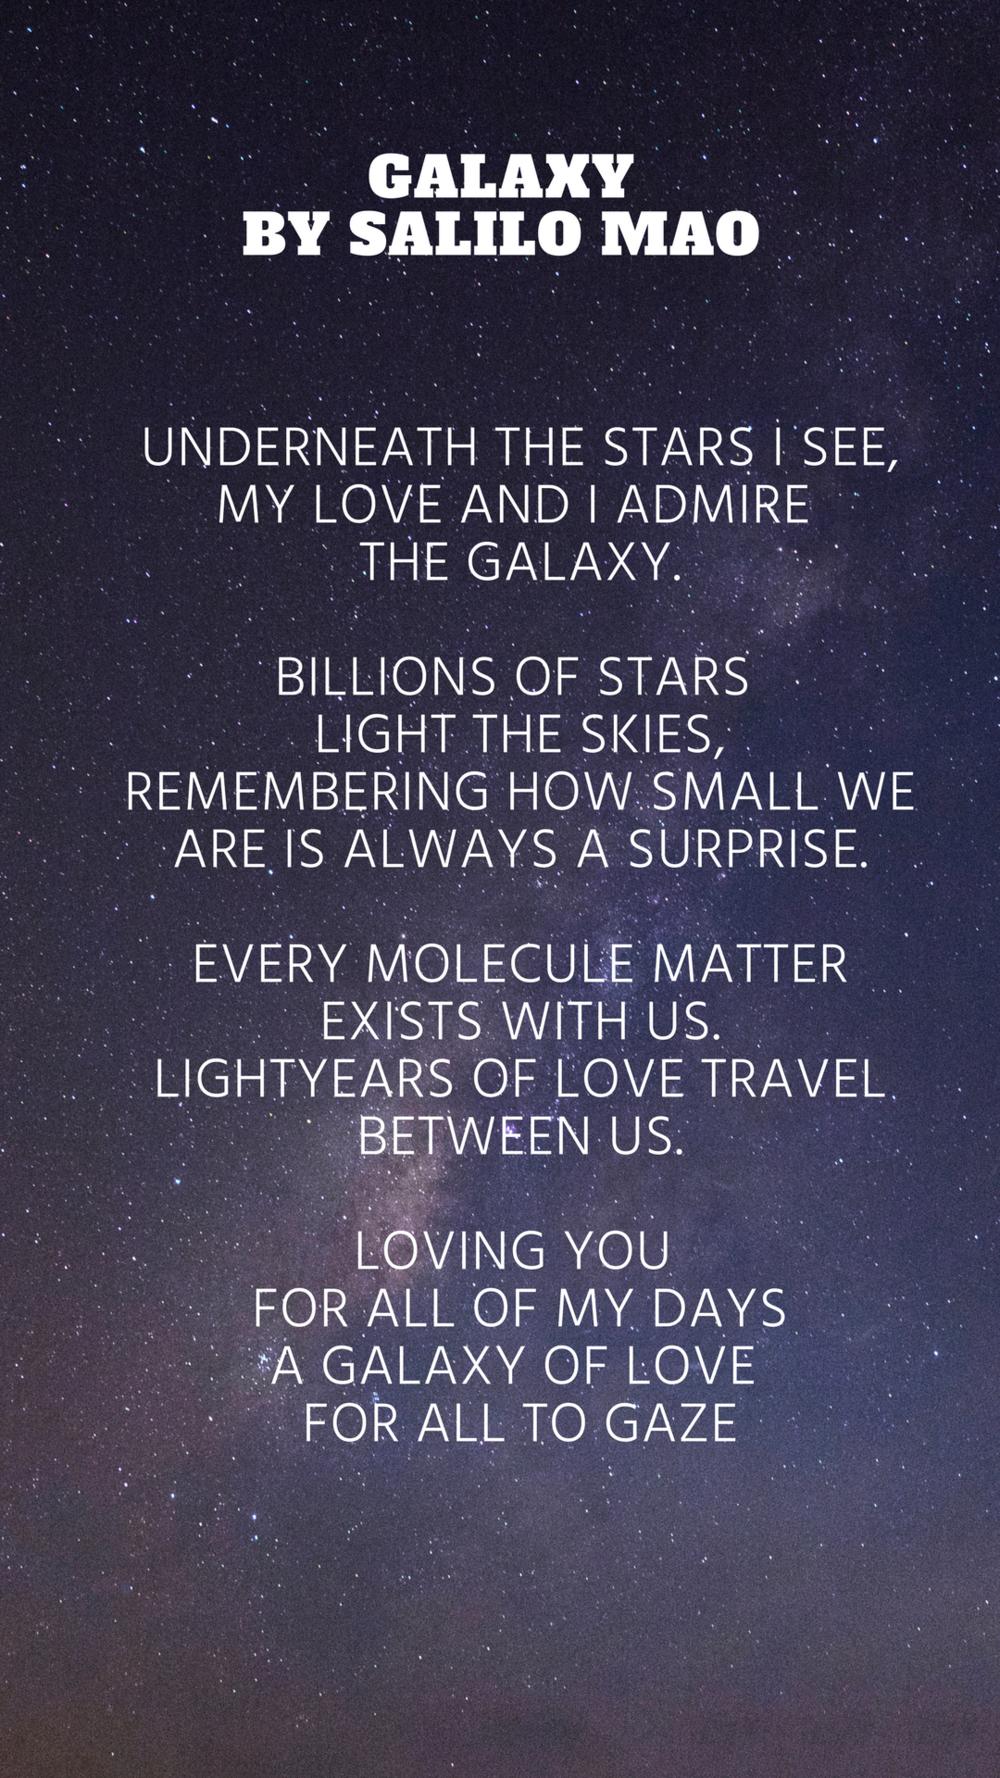 Galaxy - Salilo (1).png